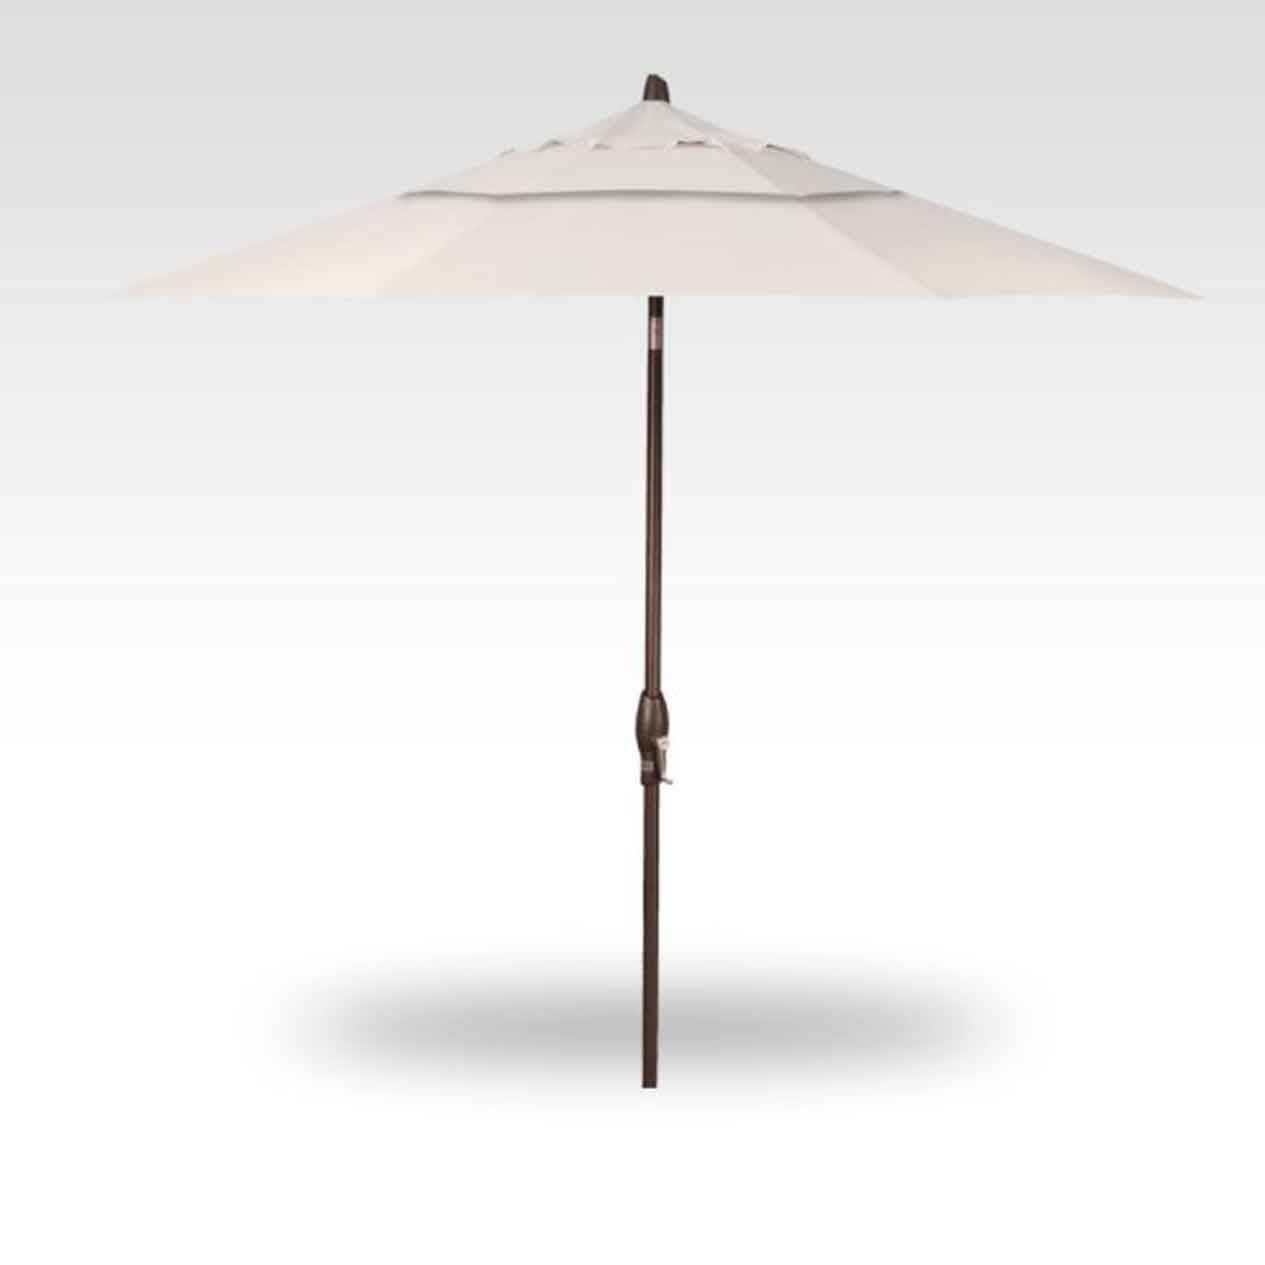 9' Auto Tilt Market Umbrella - Canvas Canvas